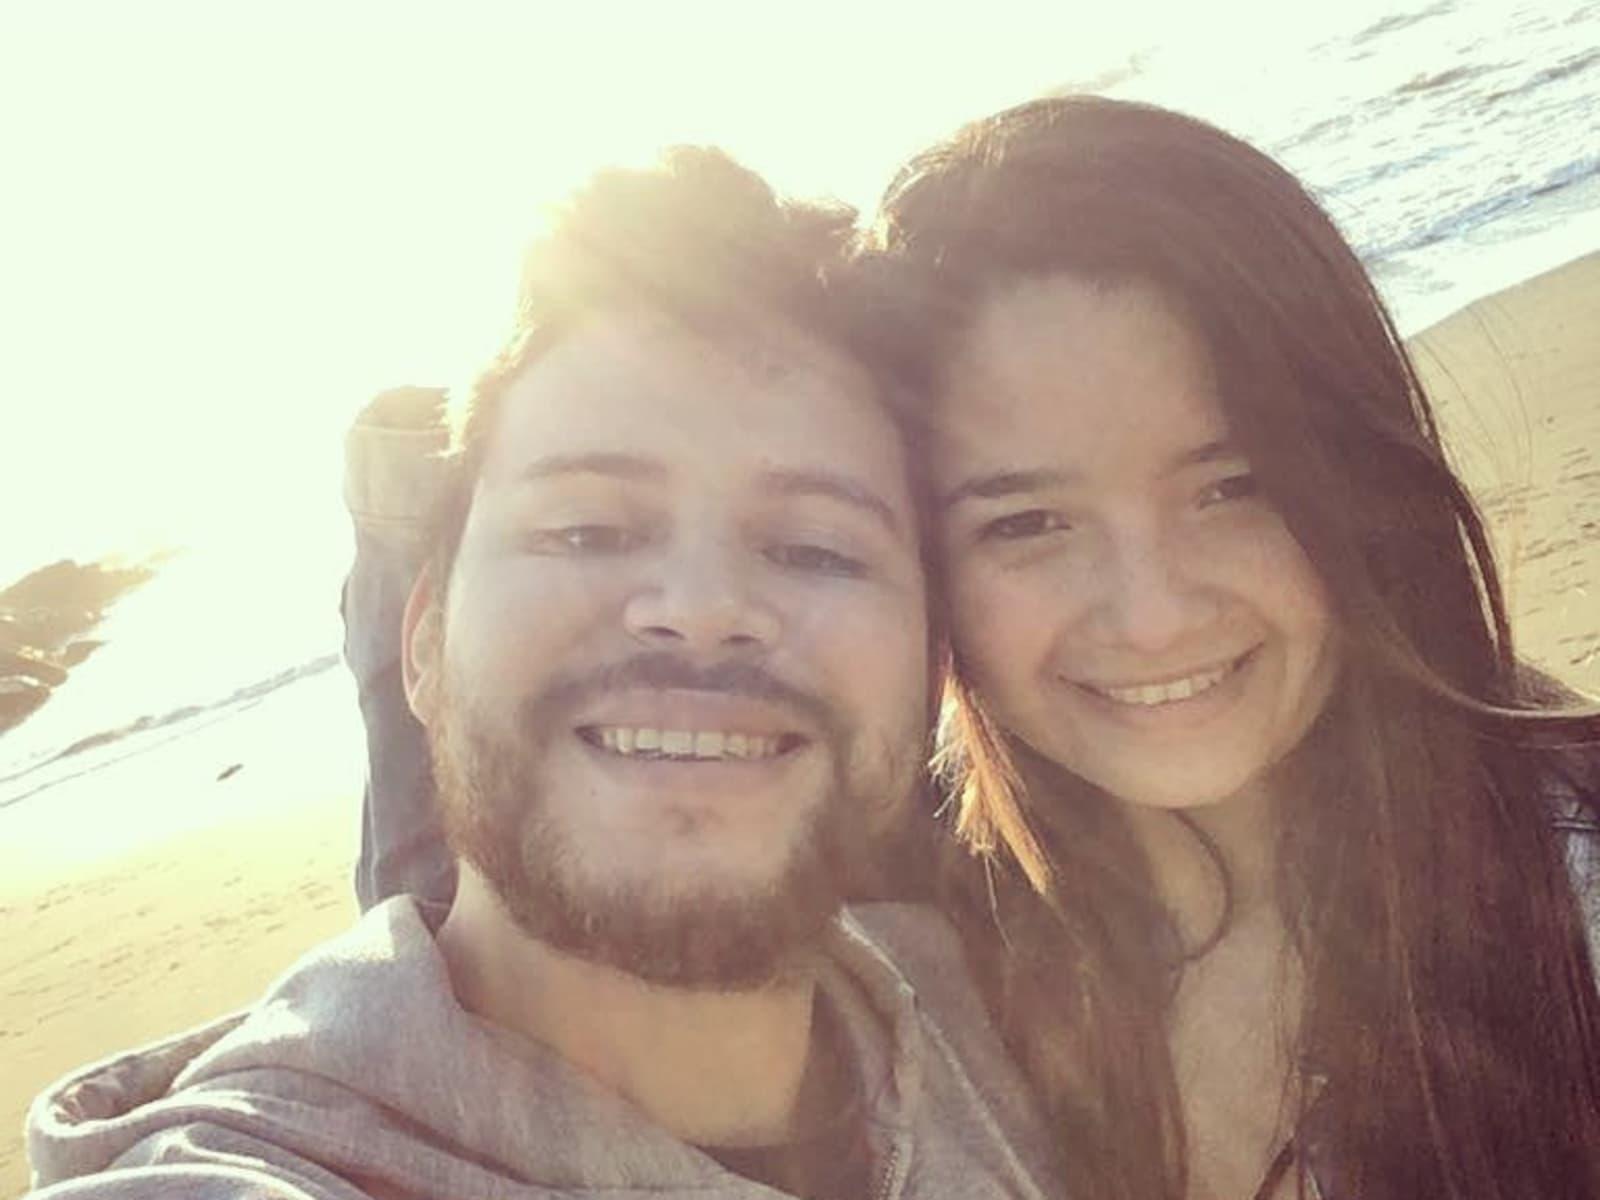 Francisco & Paola from Talca, Chile